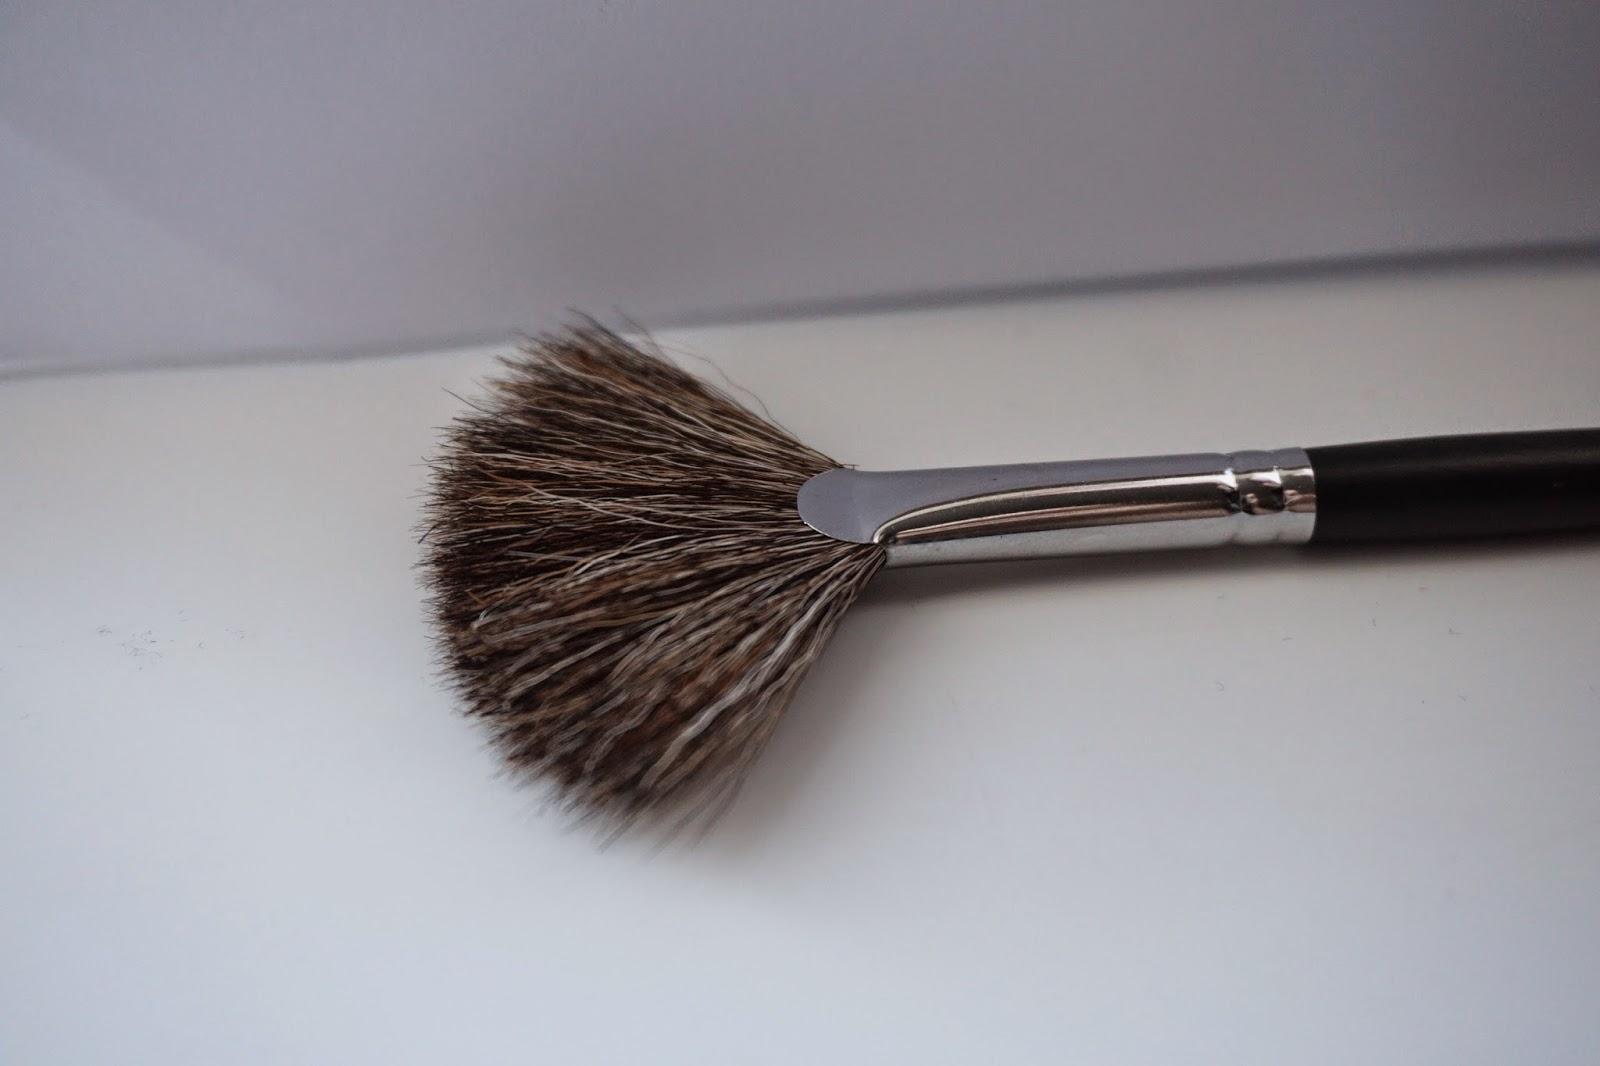 Crown Brush Review C600 Design Fan - Dusty Foxes Beauty